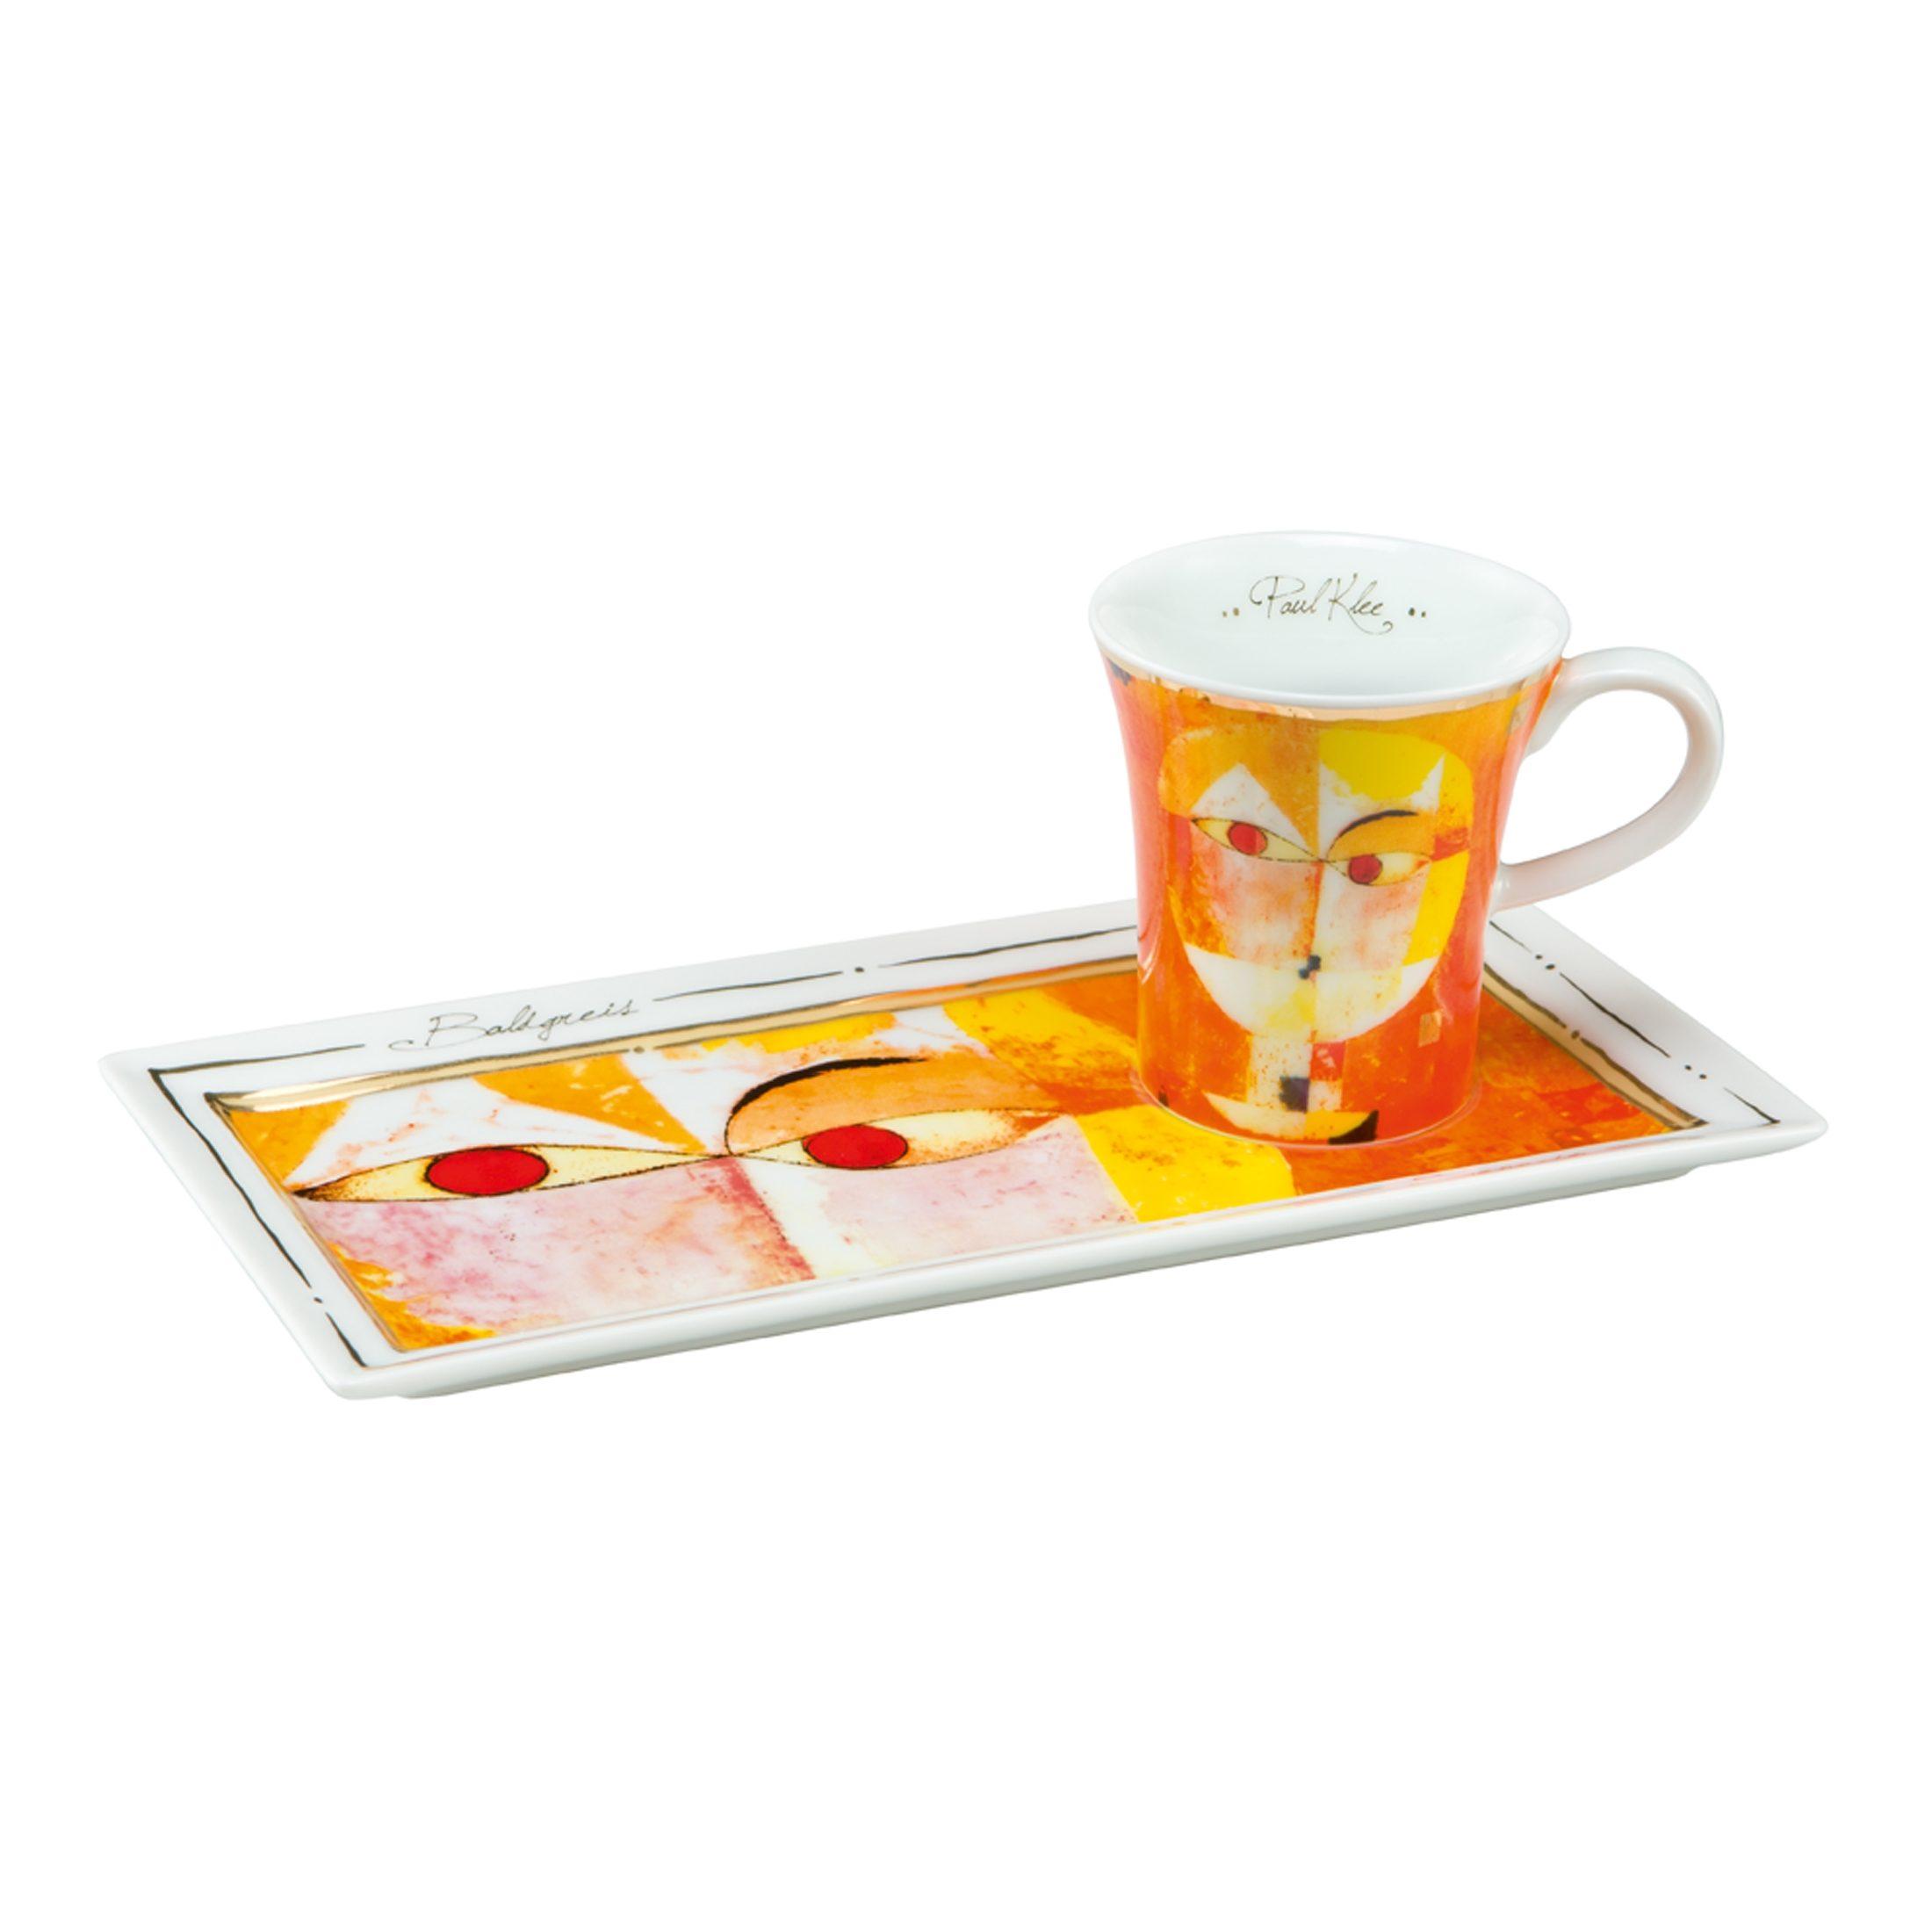 Goebel Baldgreis - Espresso Set »Artis Orbis«